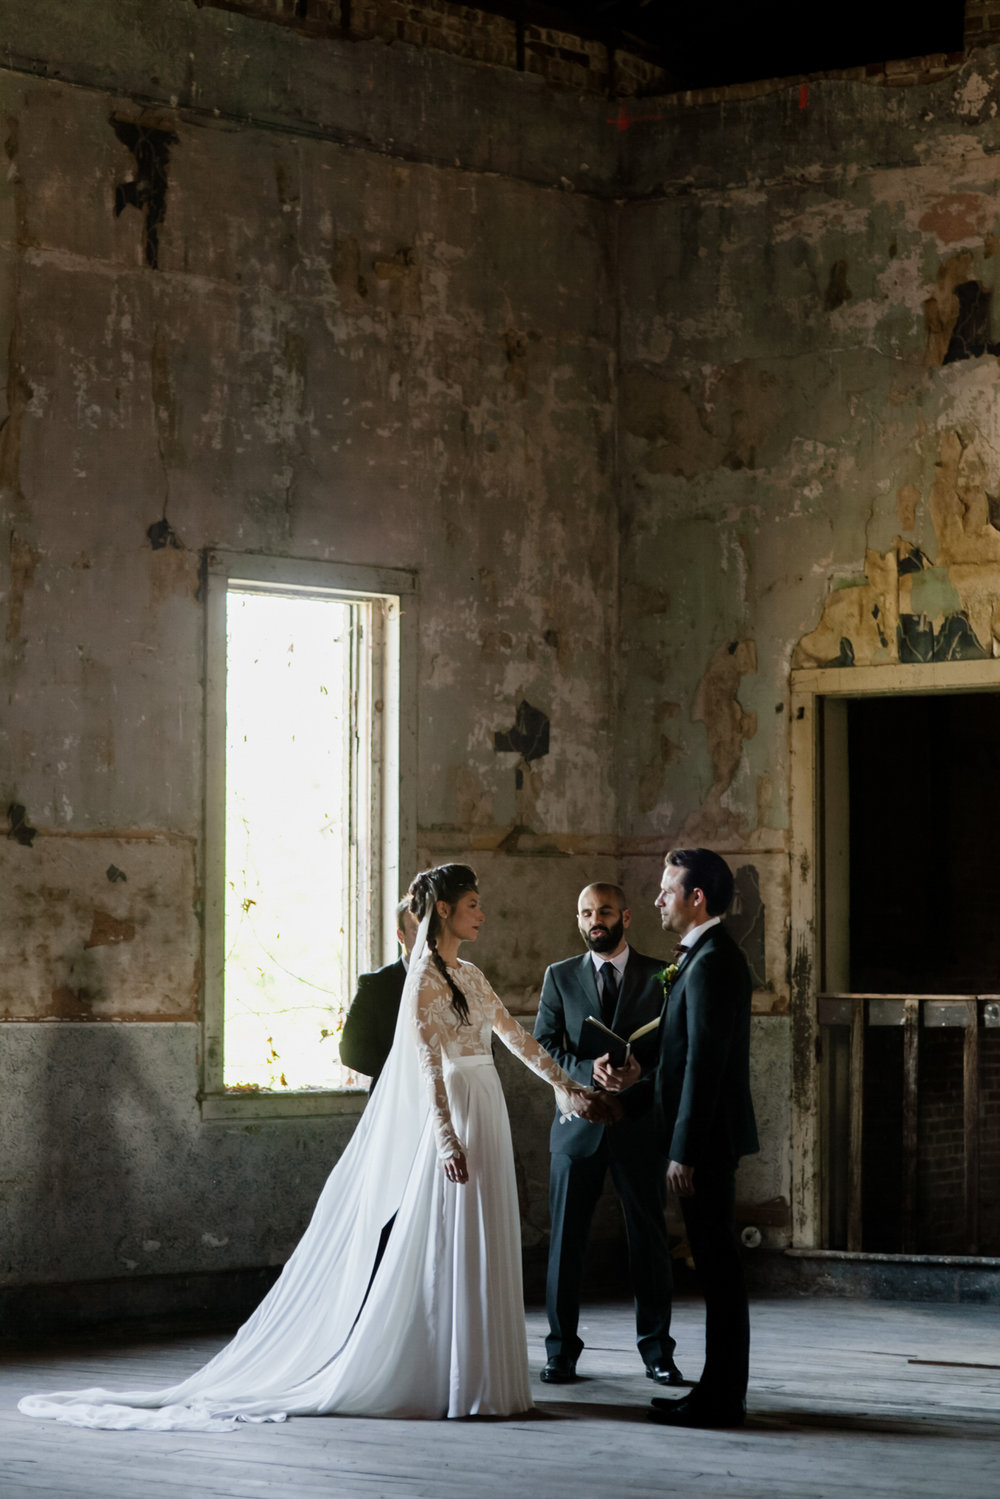 Kimberly-Coccagnia-Wedding-Photographer-87.JPG